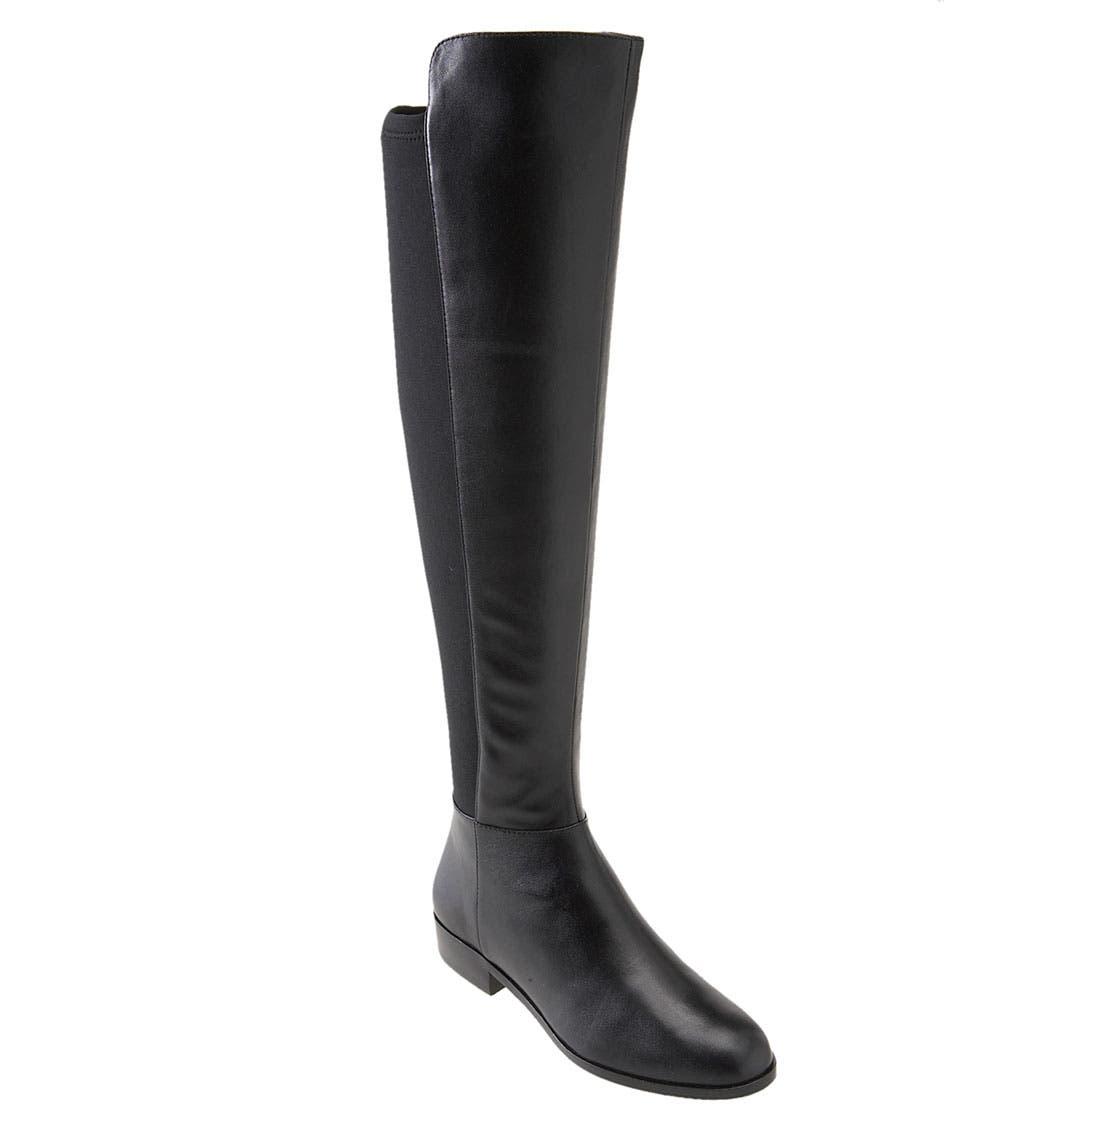 Main Image - MICHAEL Michael Kors 'Bromley' Over the Knee Boot